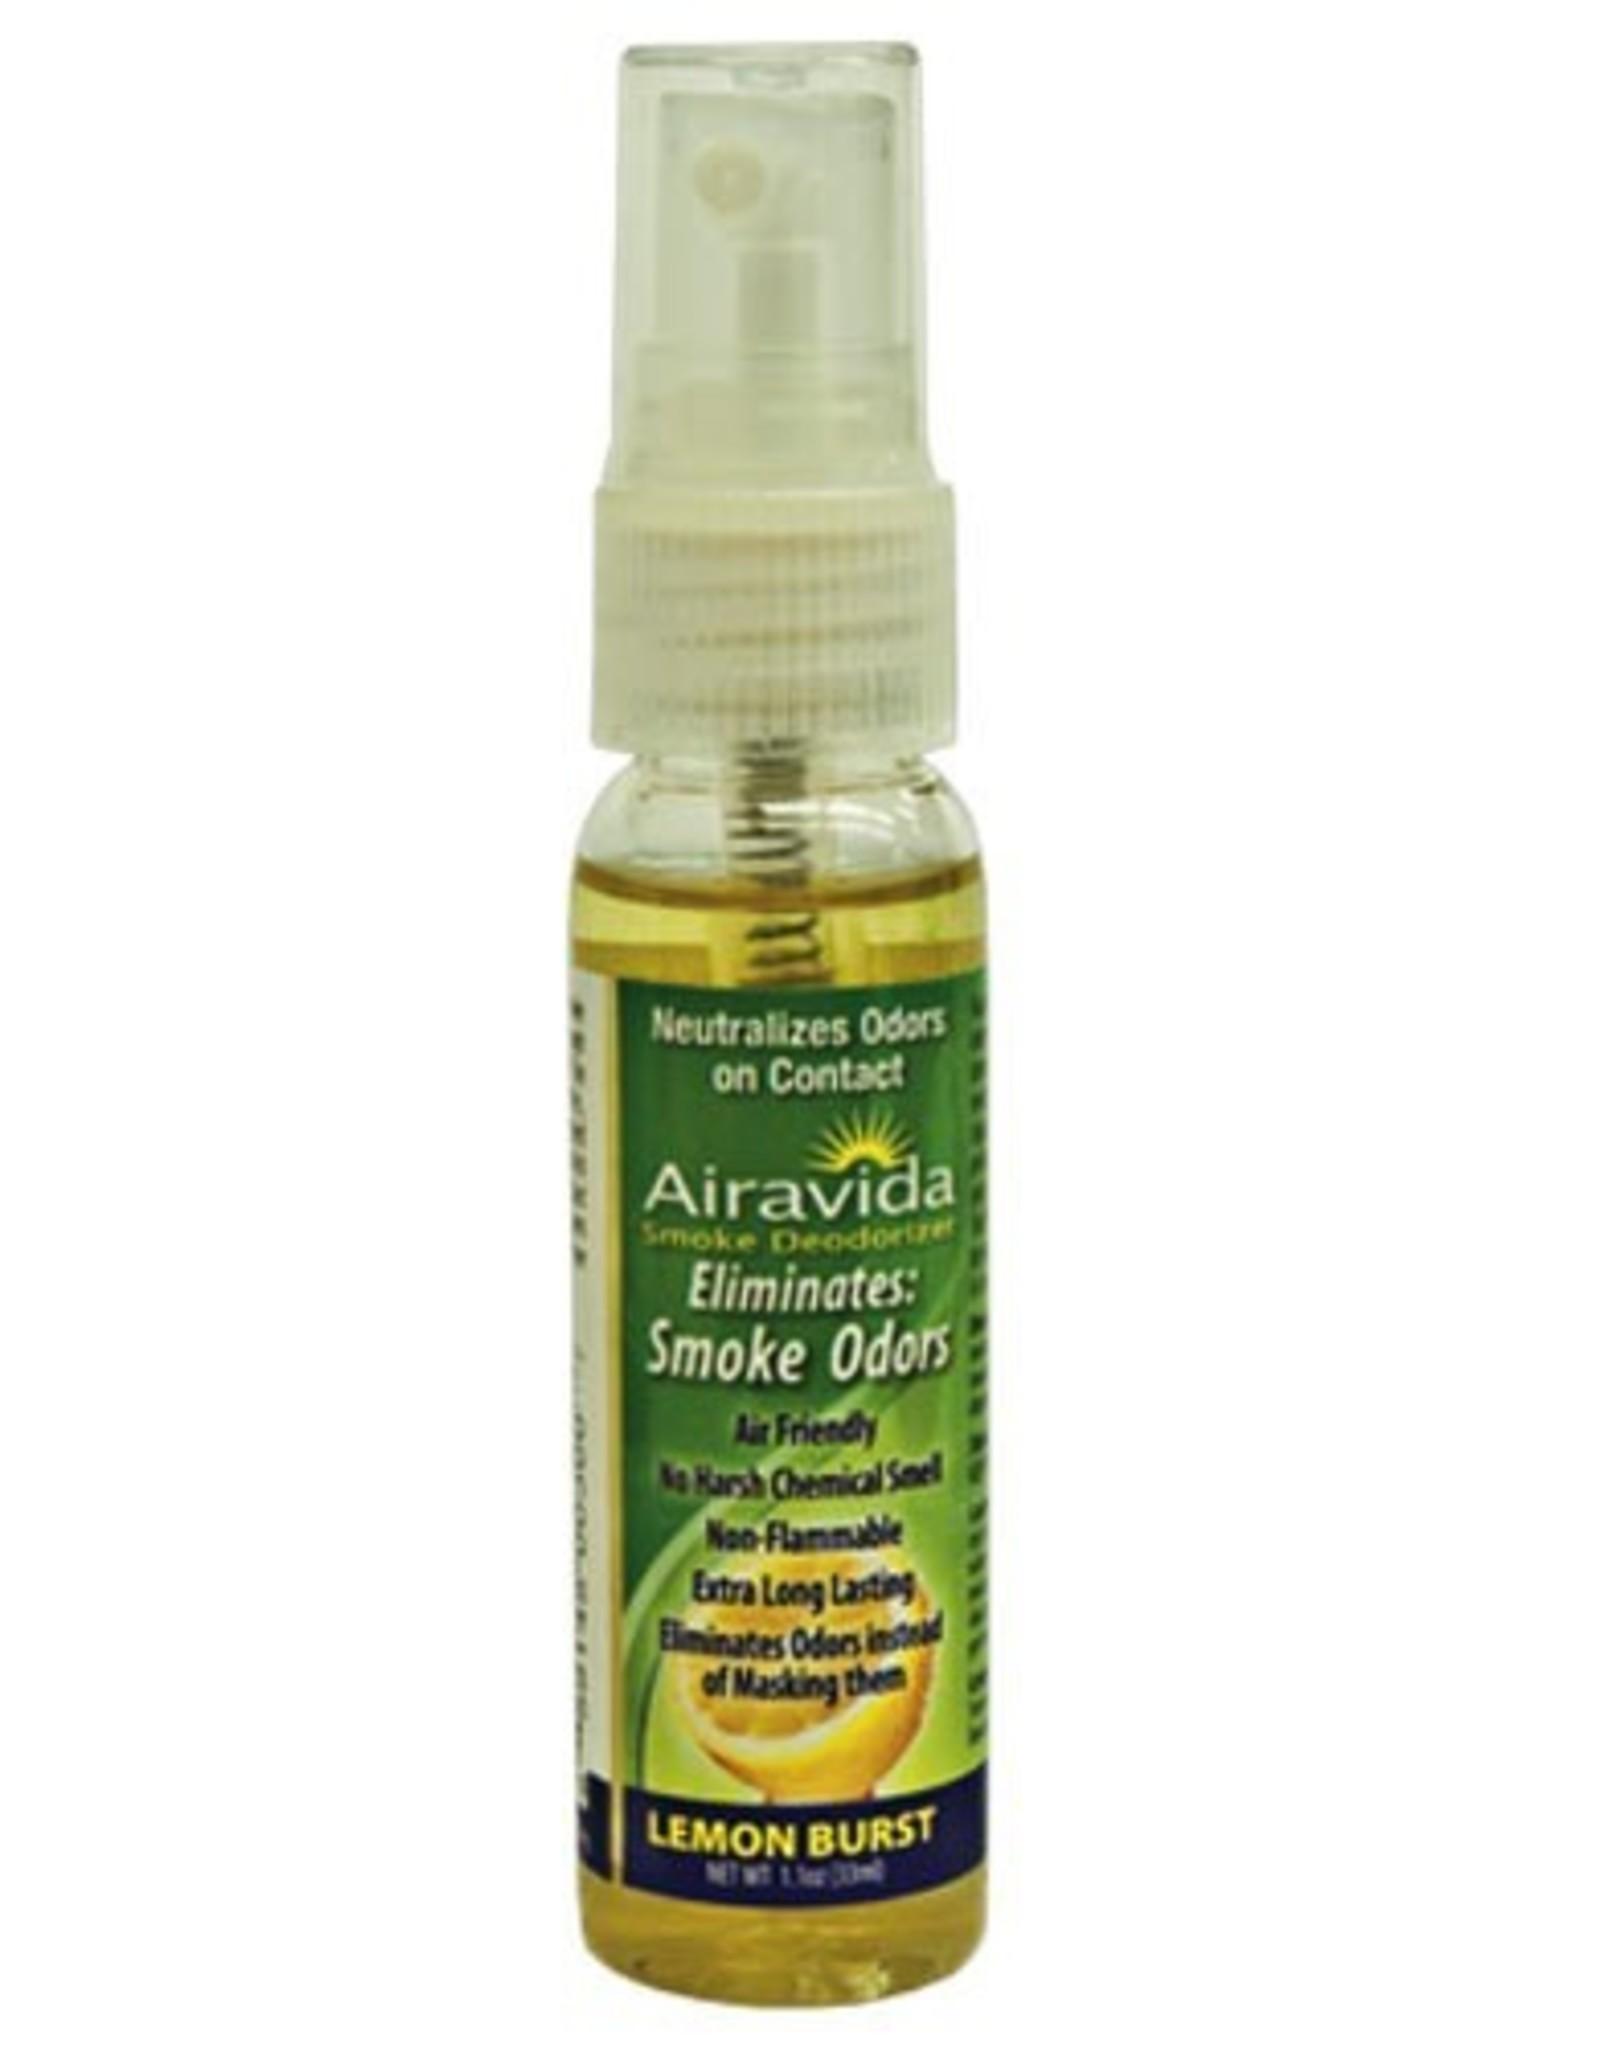 DL WHOLESALE Airavida Smoke Deodorizer - 1.1 oz